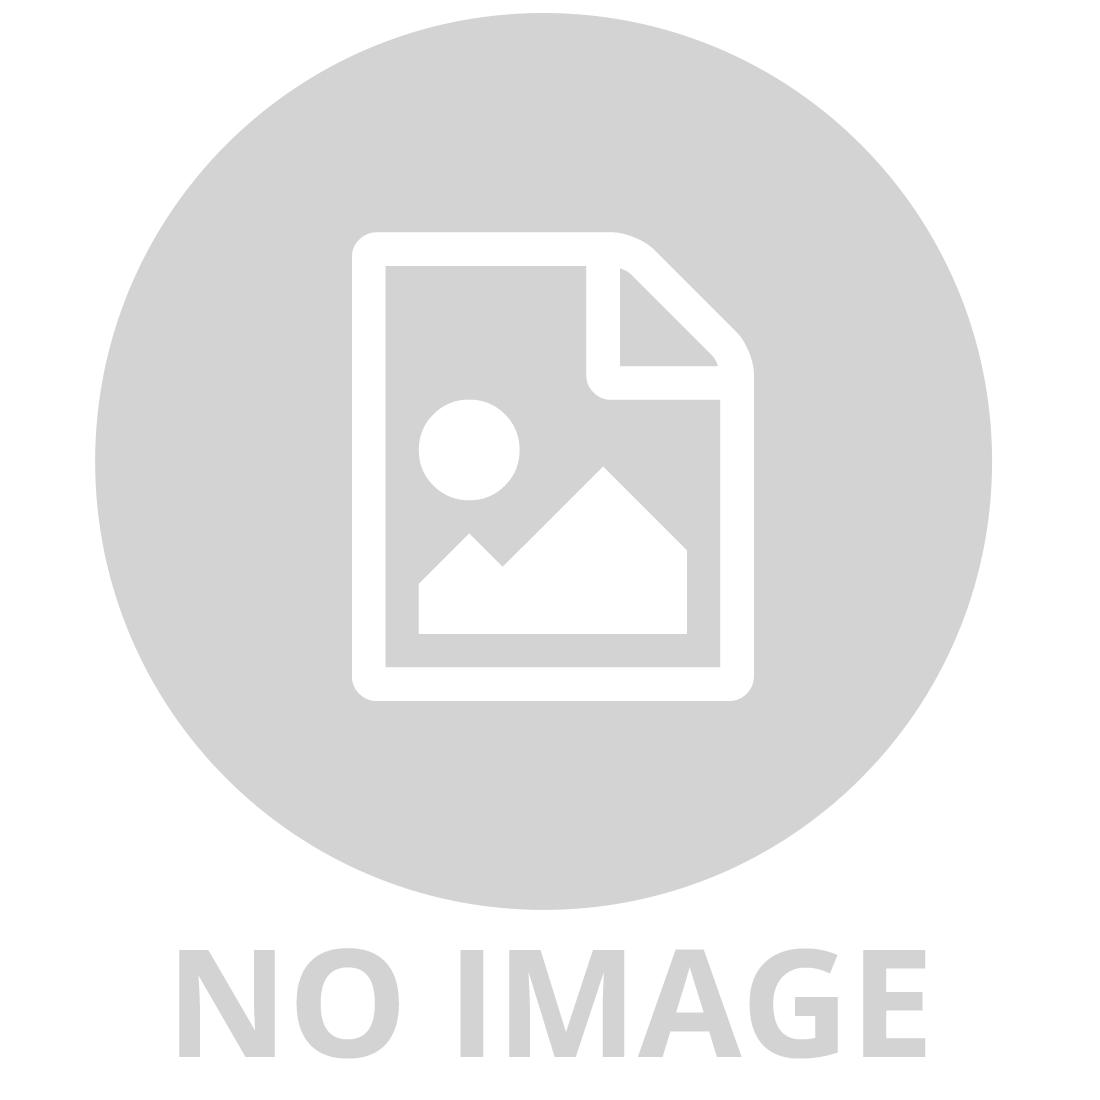 RAVENSBURGER CATNAP 300PC